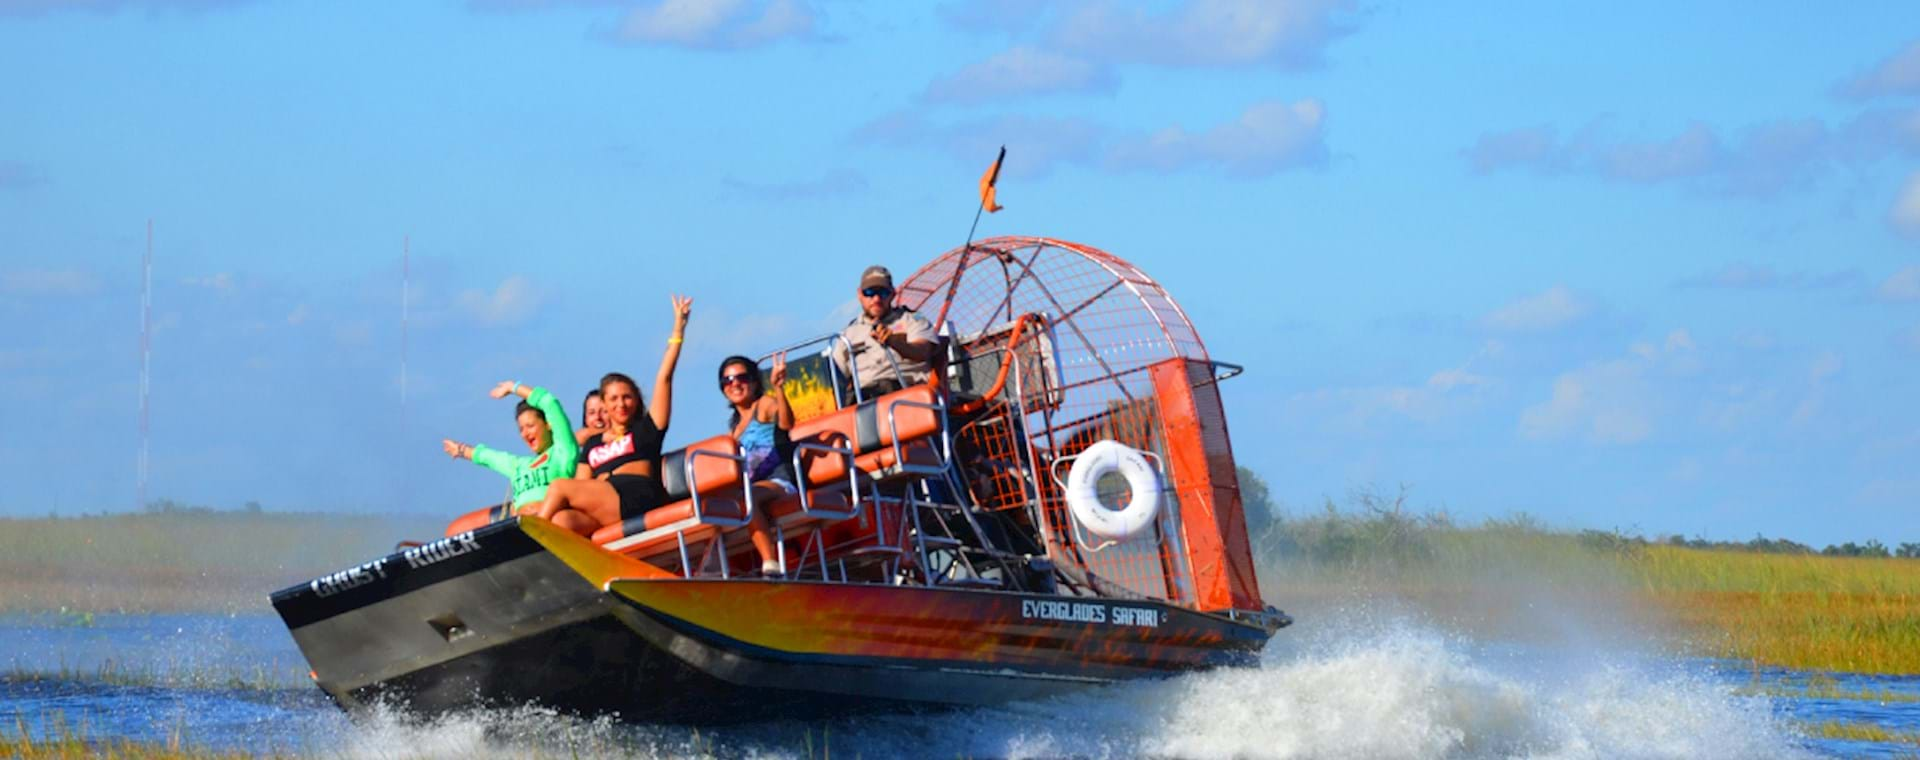 People having fun during an airboat ride